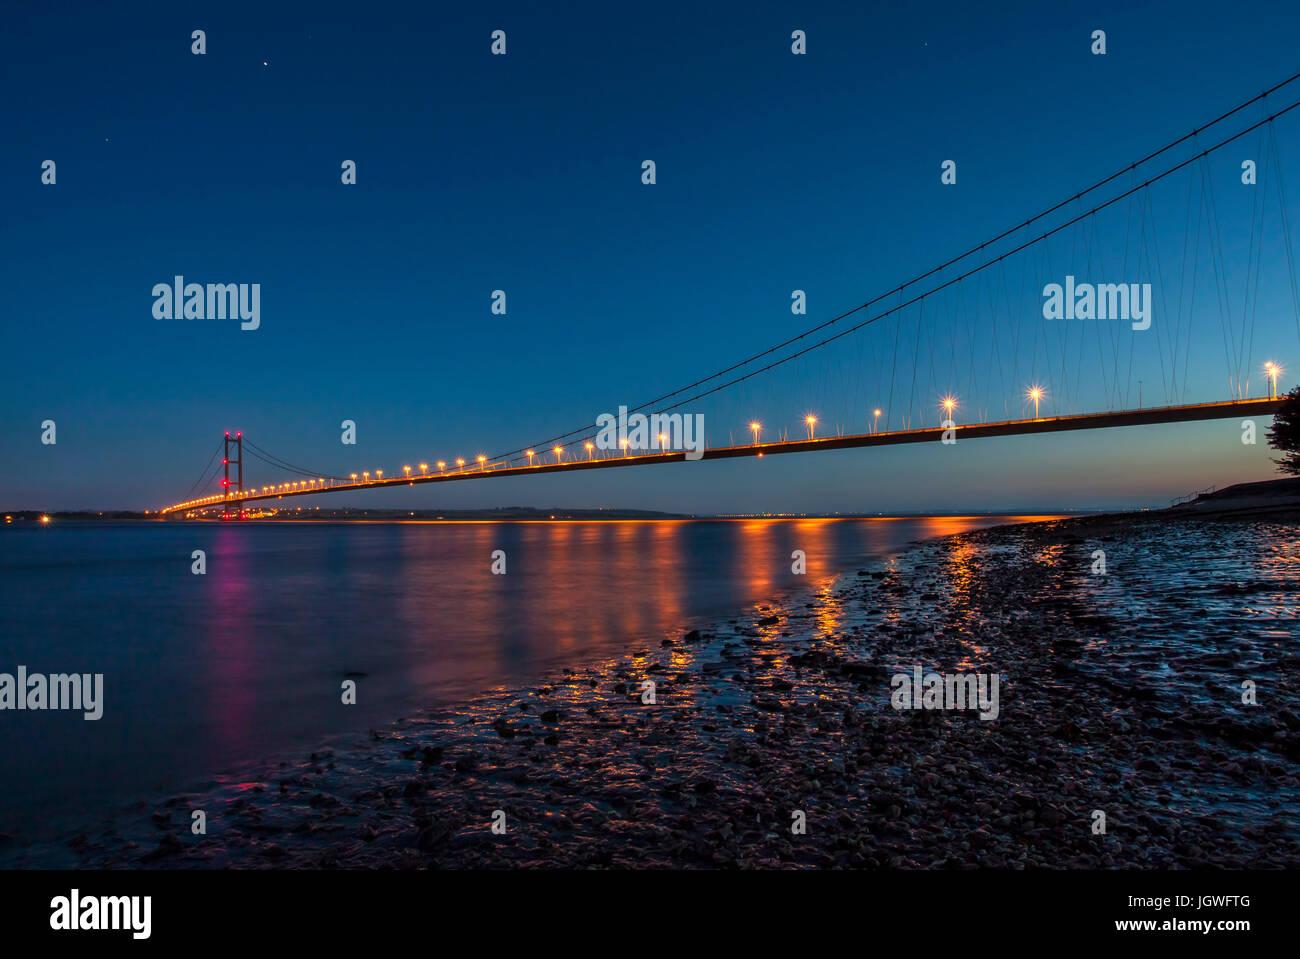 Humber Bridge at night - Stock Image